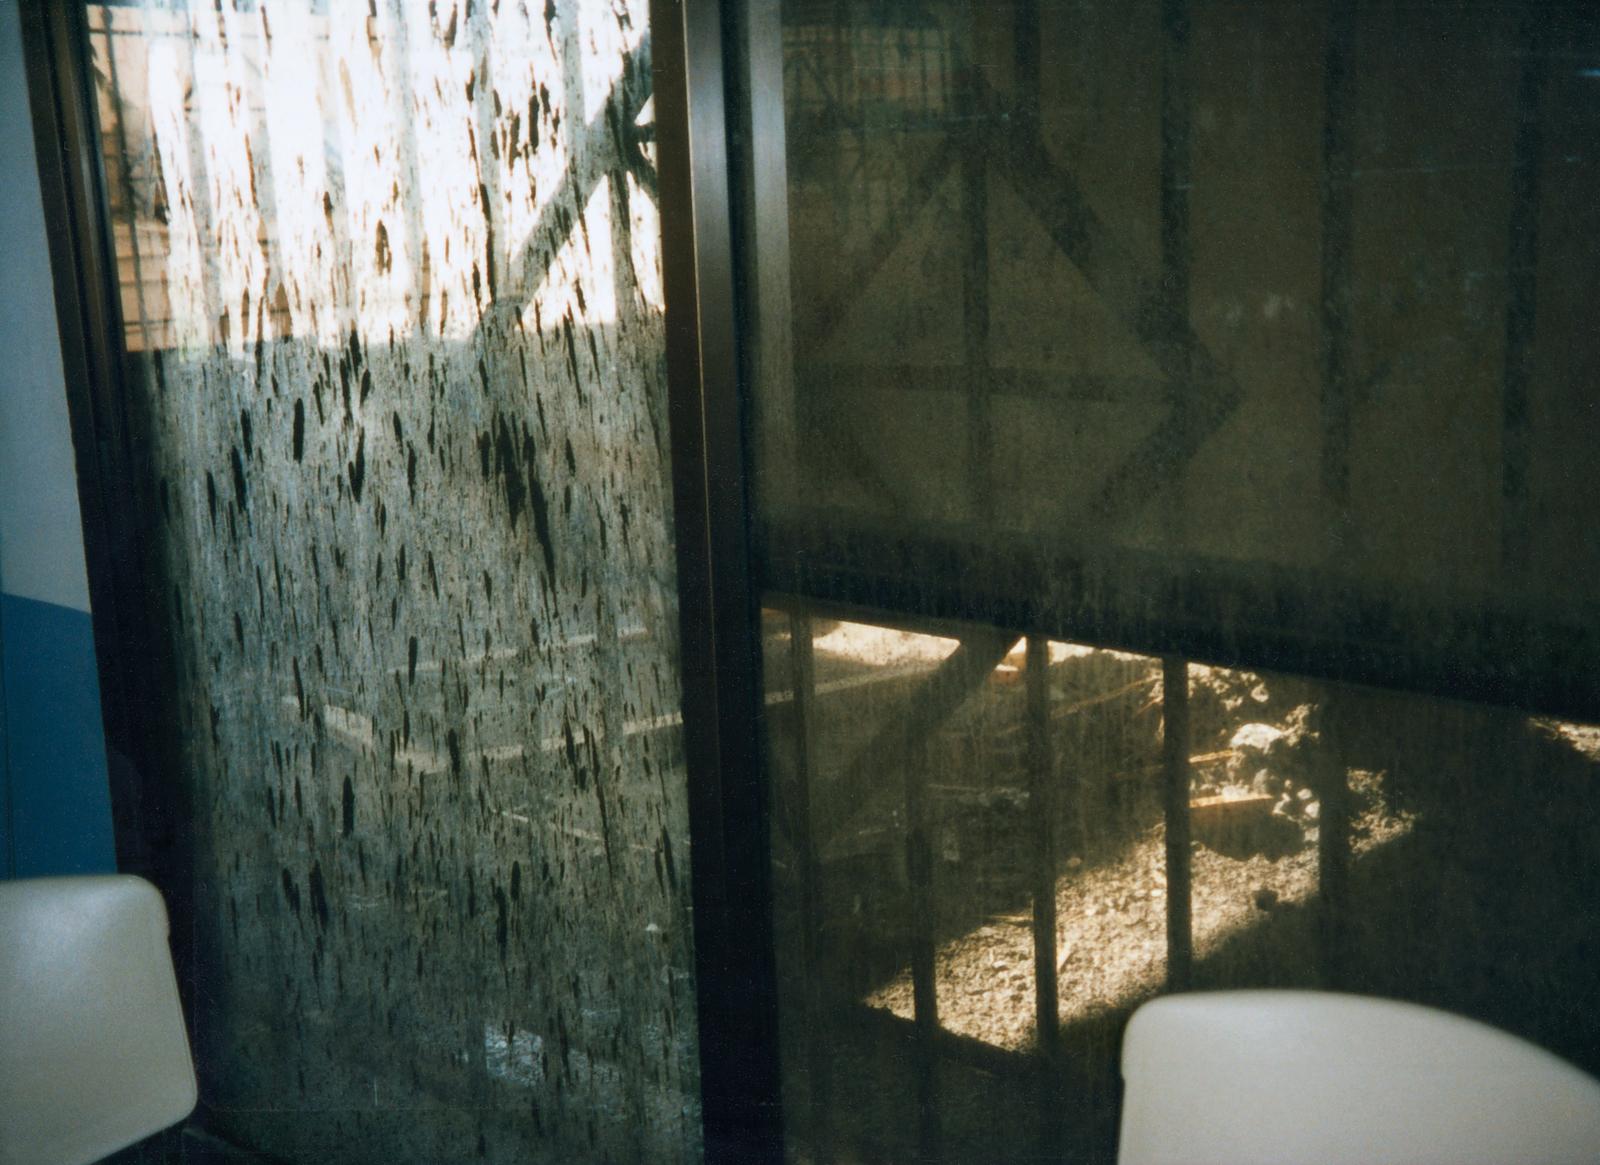 Abu Dhabi - Vacant Site - 1996